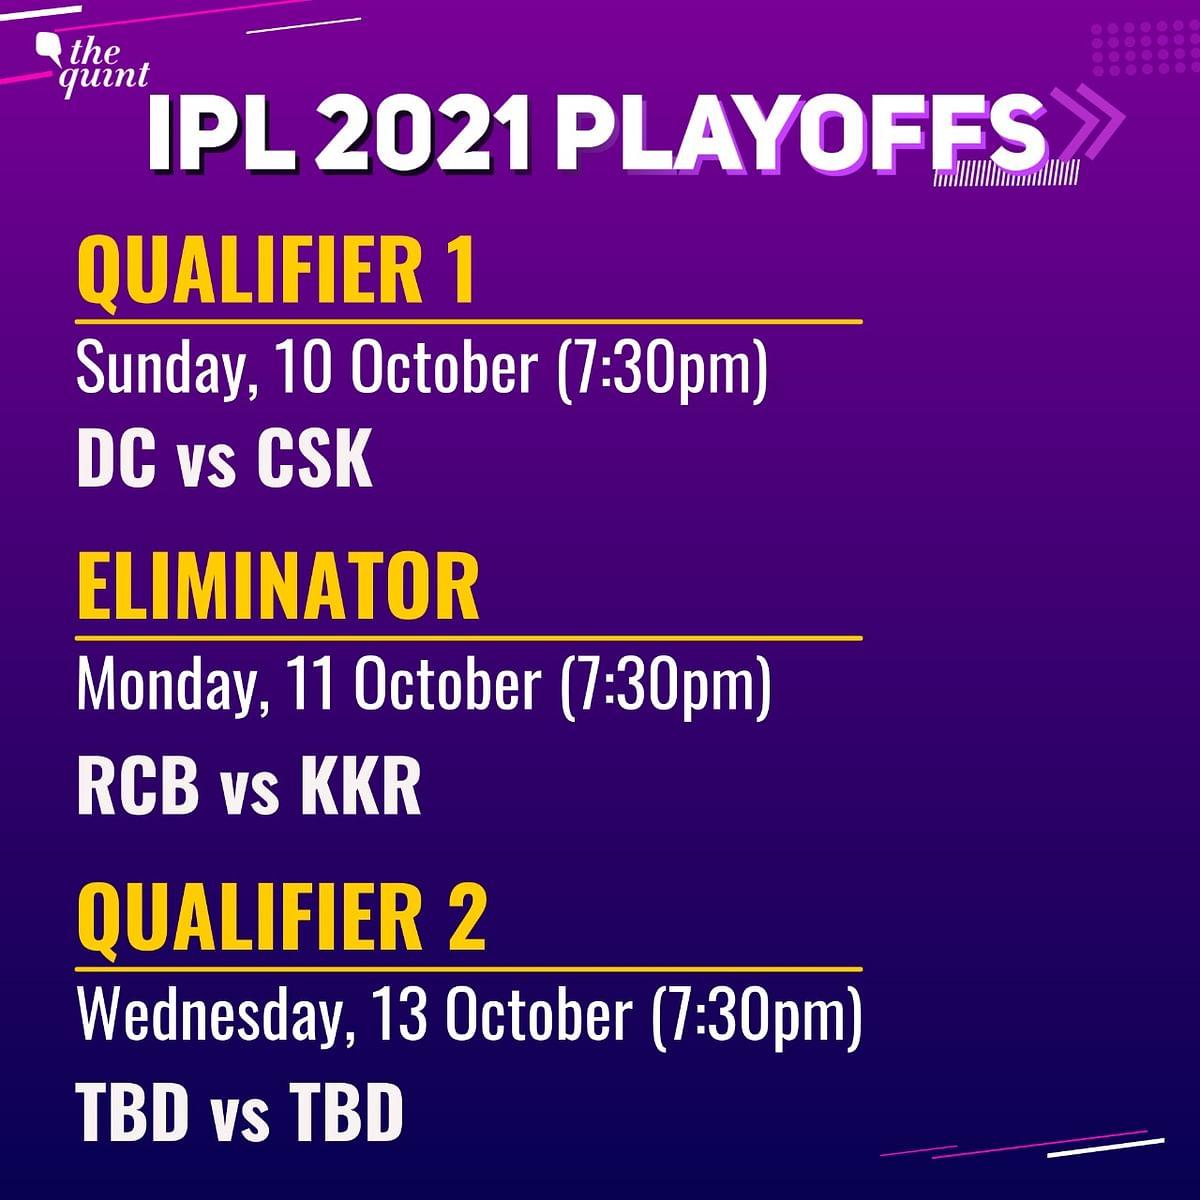 IPL 2021: DC, CSK, RCB & KKR Qualify for Playoffs